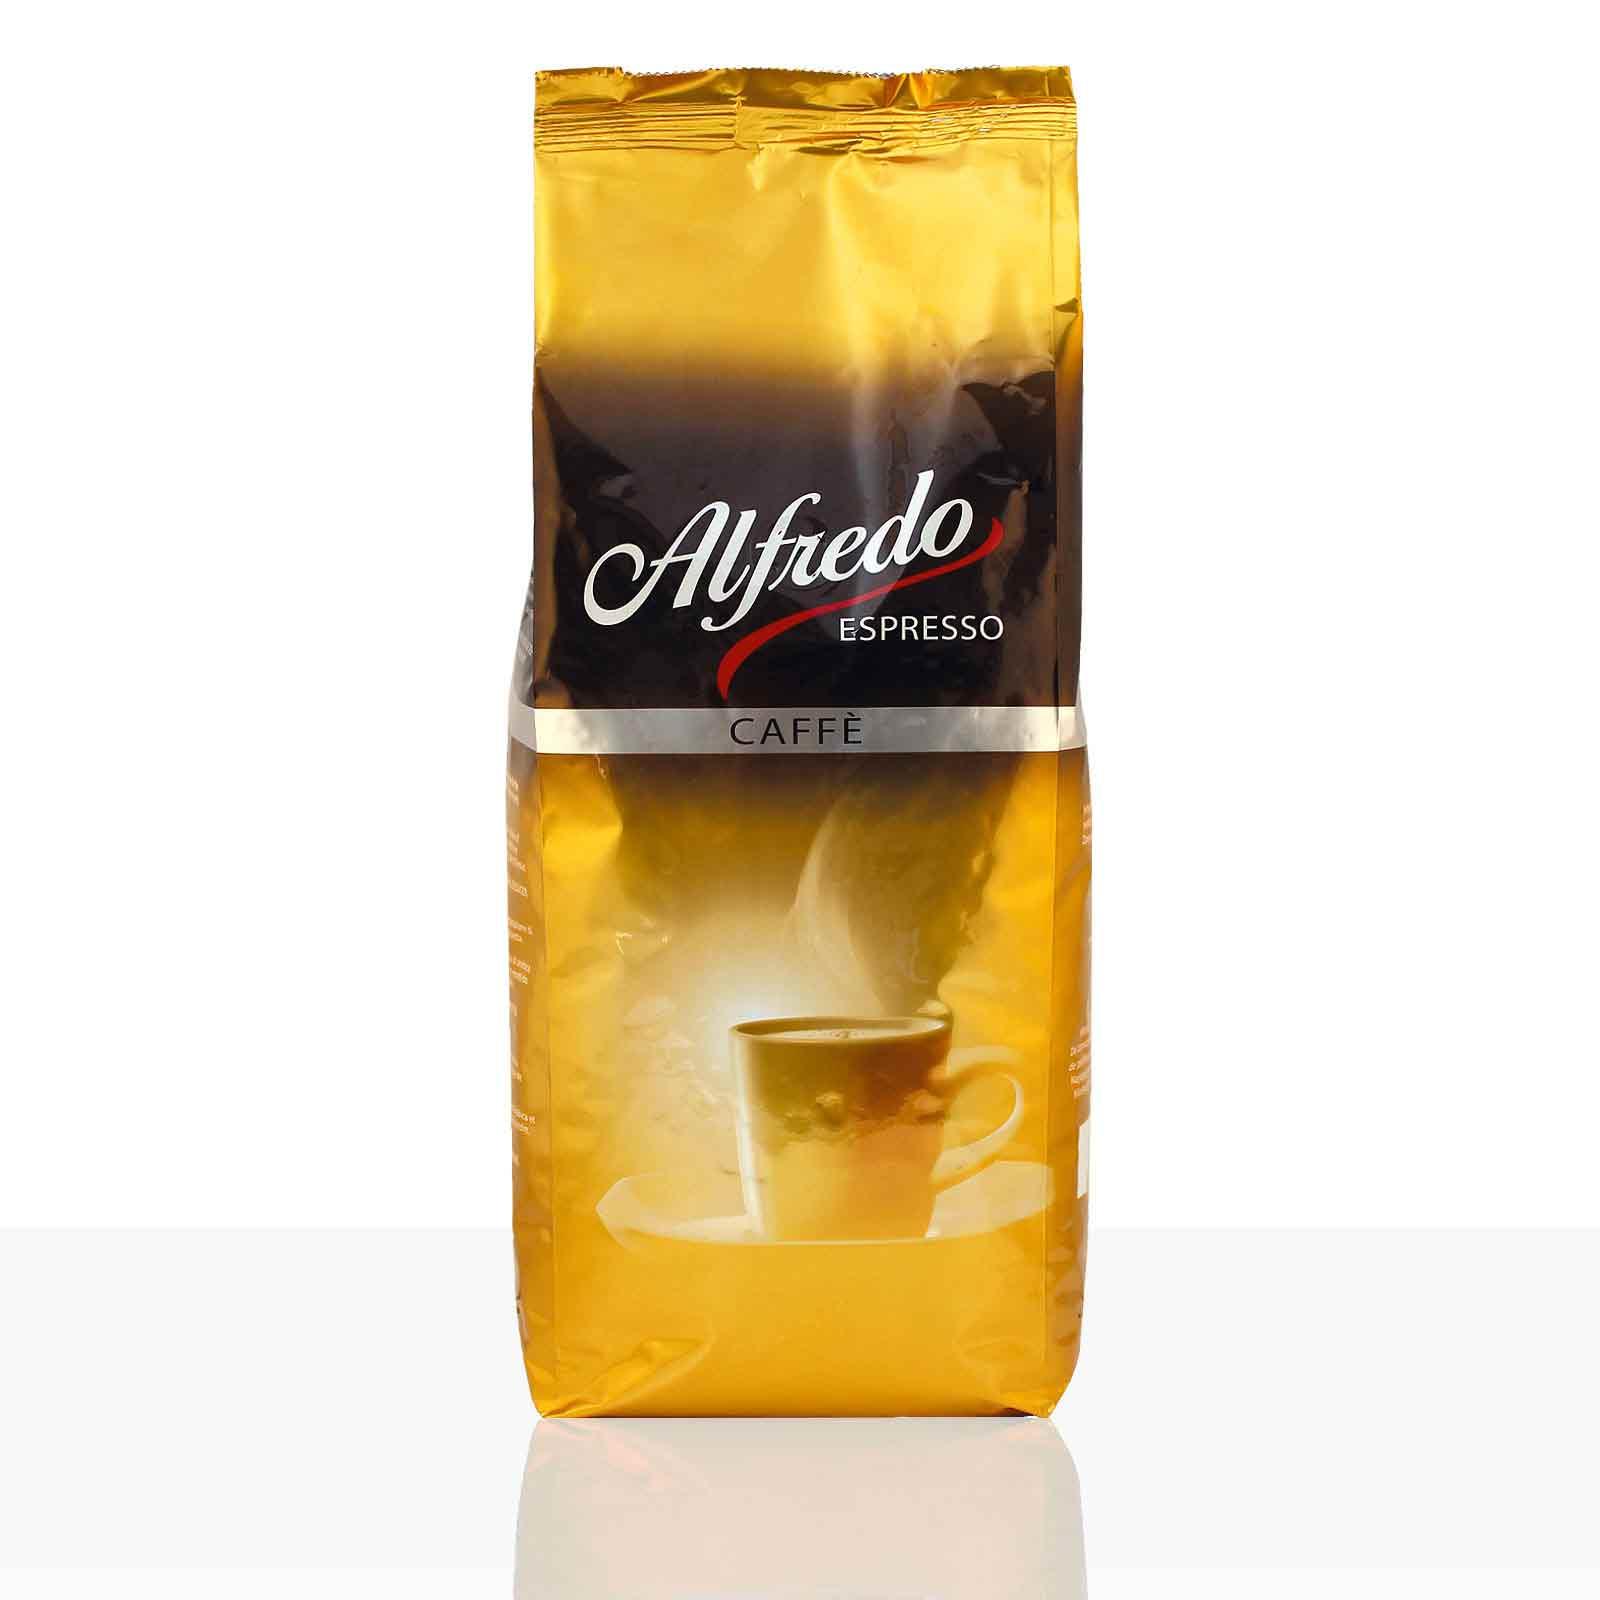 Darboven Alfredo Espresso Caffè Creme - 6 x 1kg ganze Kaffee-Bohne Cafe